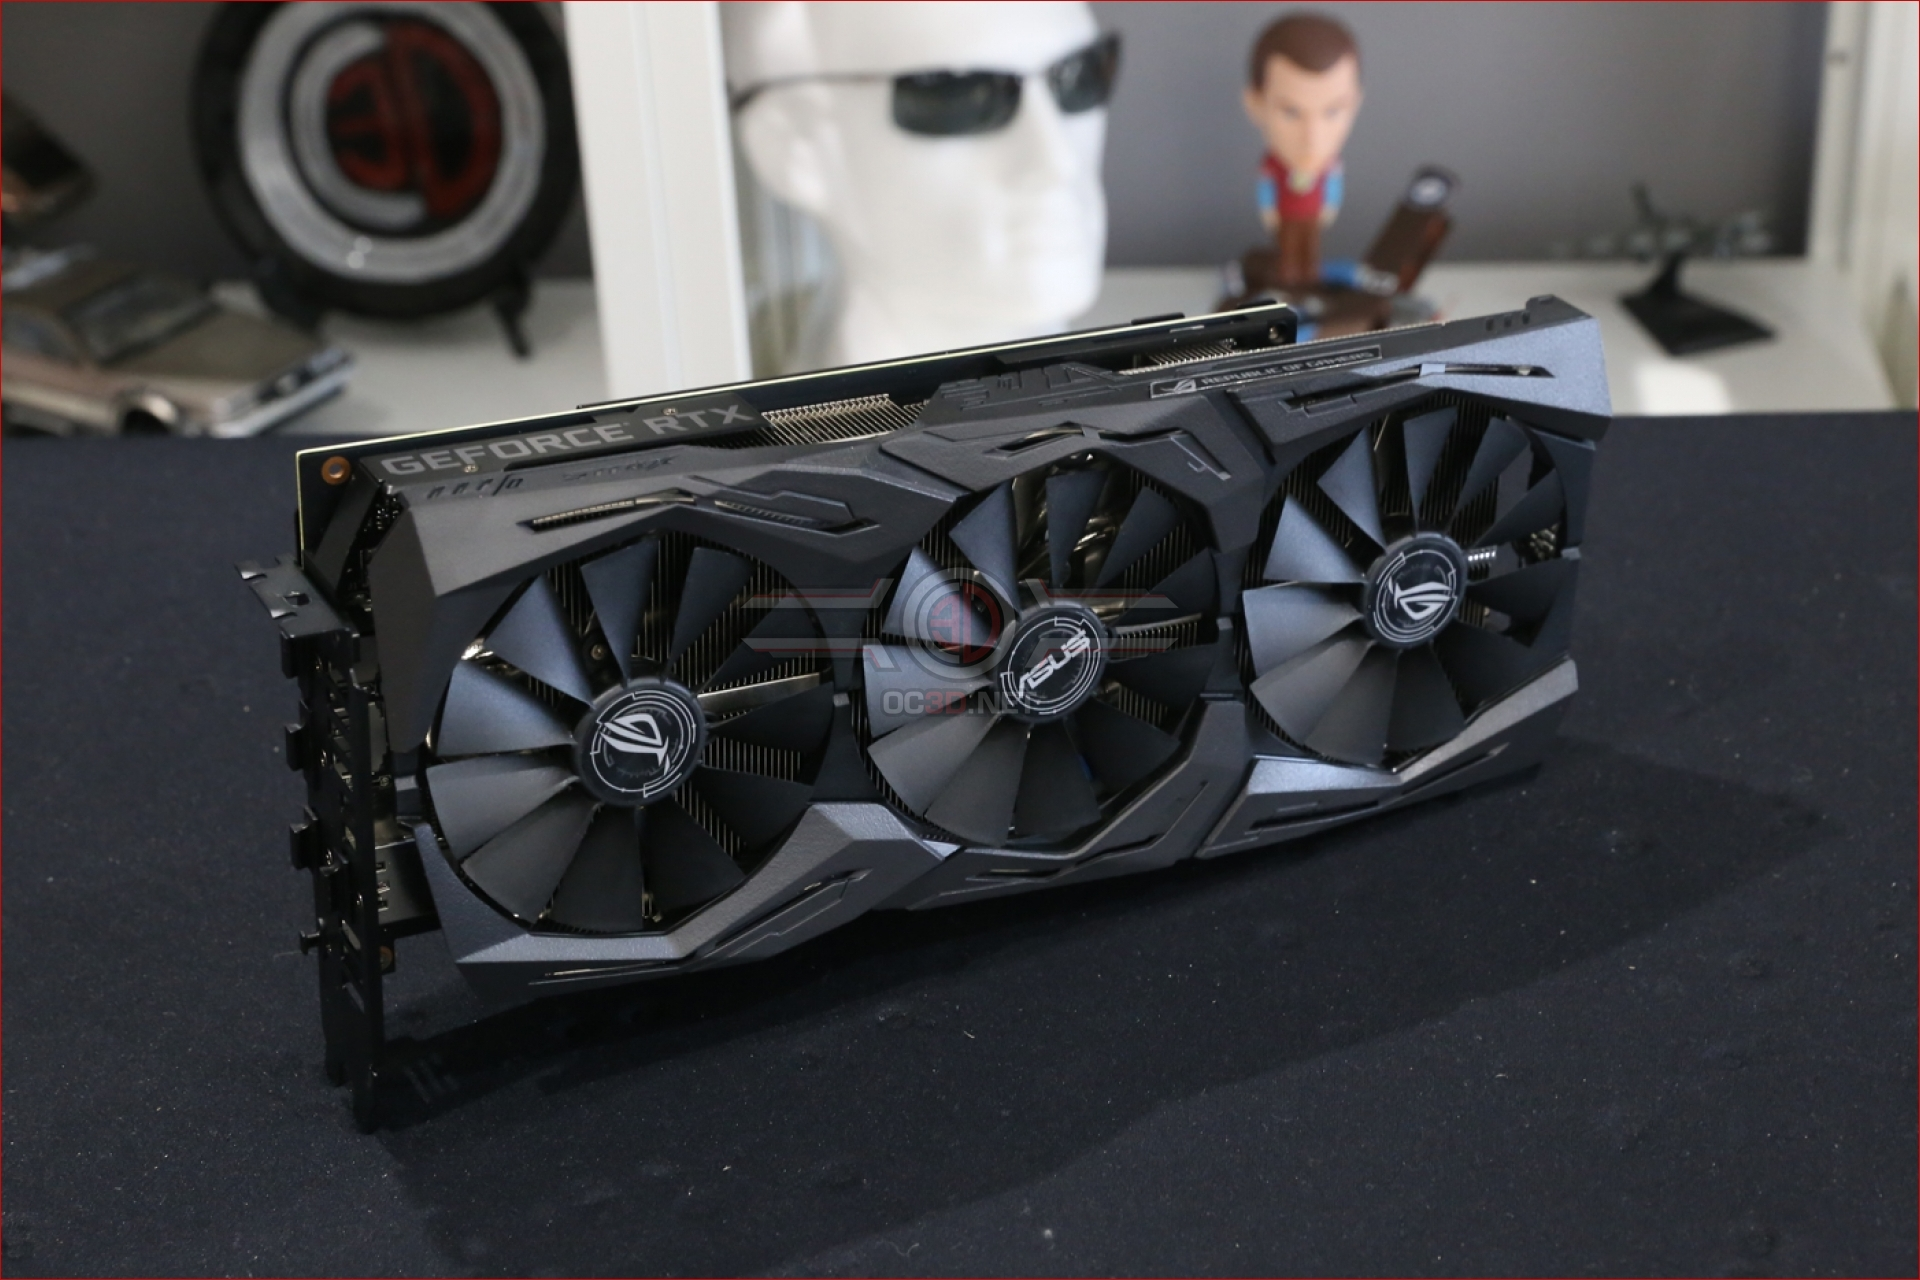 ASUS RTX 2070 ROG Strix OC Review | Up Close | GPU